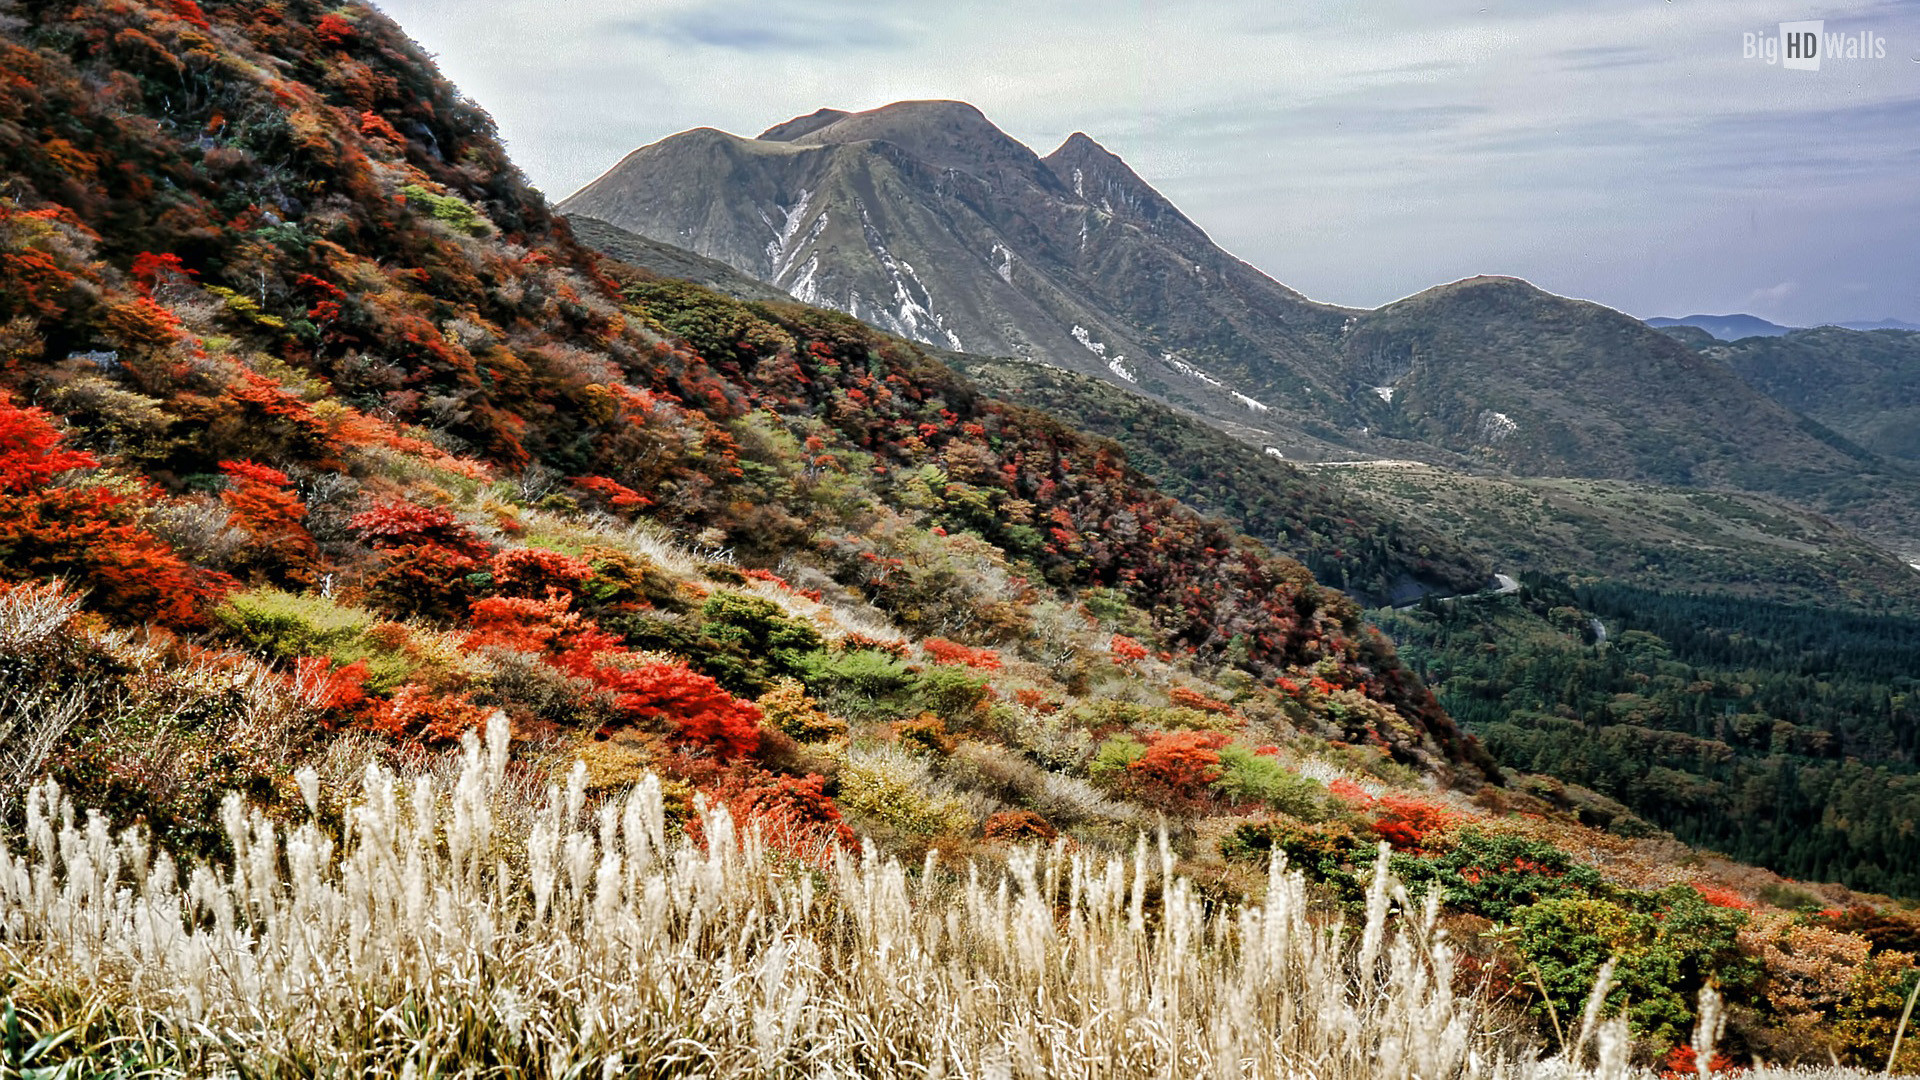 japan-mountain-Hd-Wallpaper003